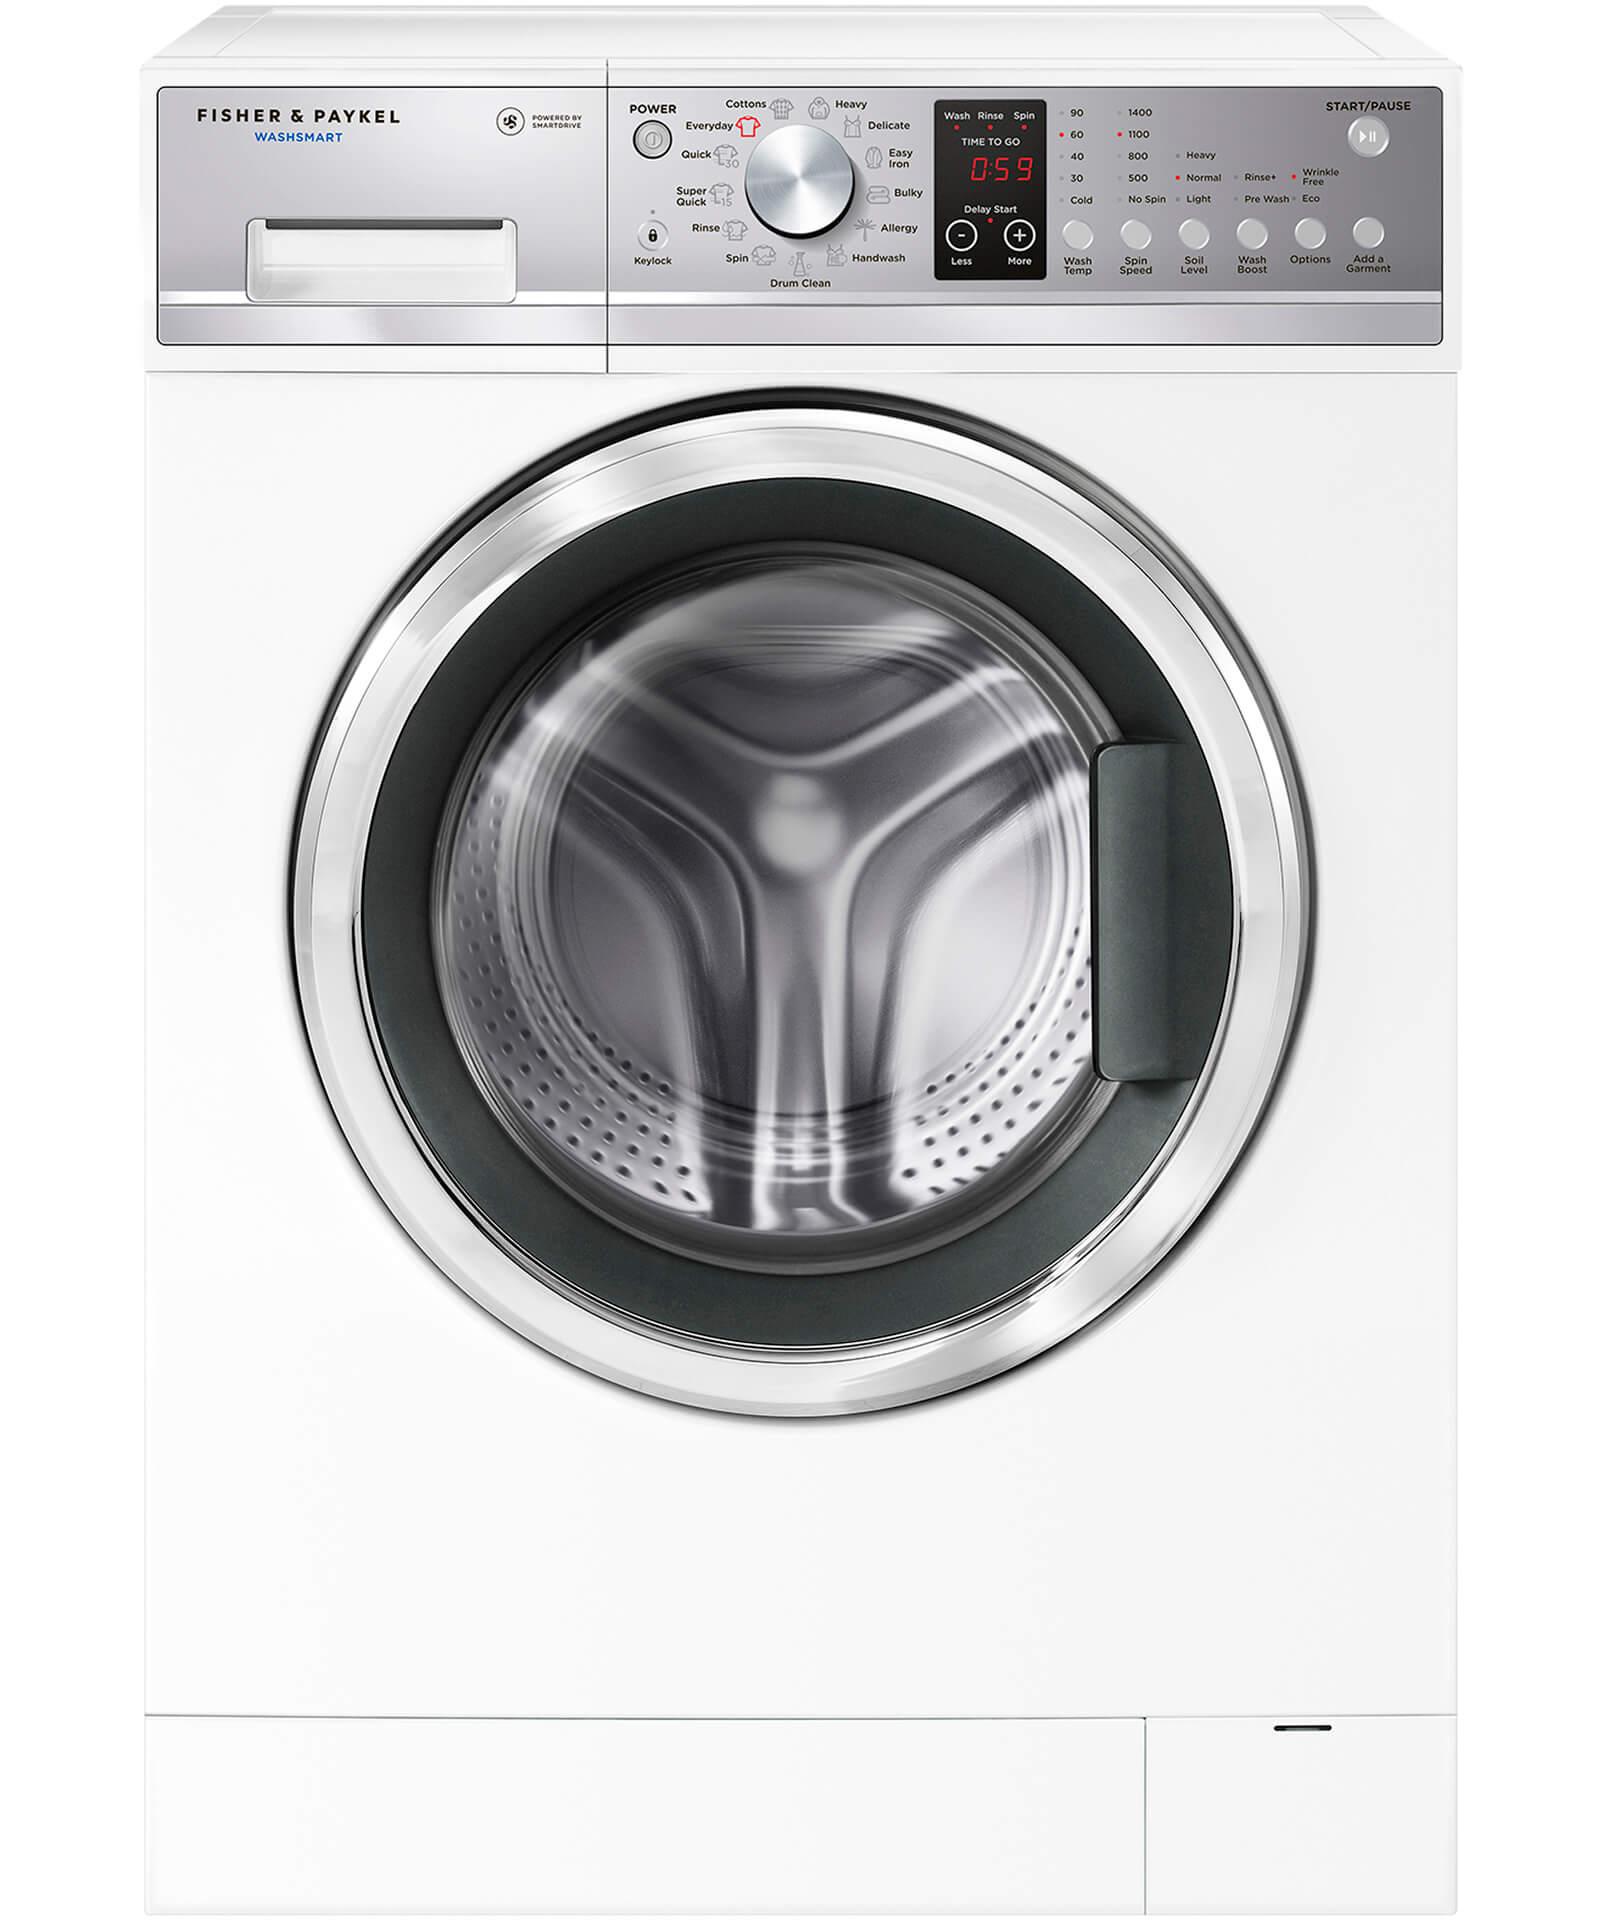 wh8060p2 - washsmart™ 8 0 kg - 93248